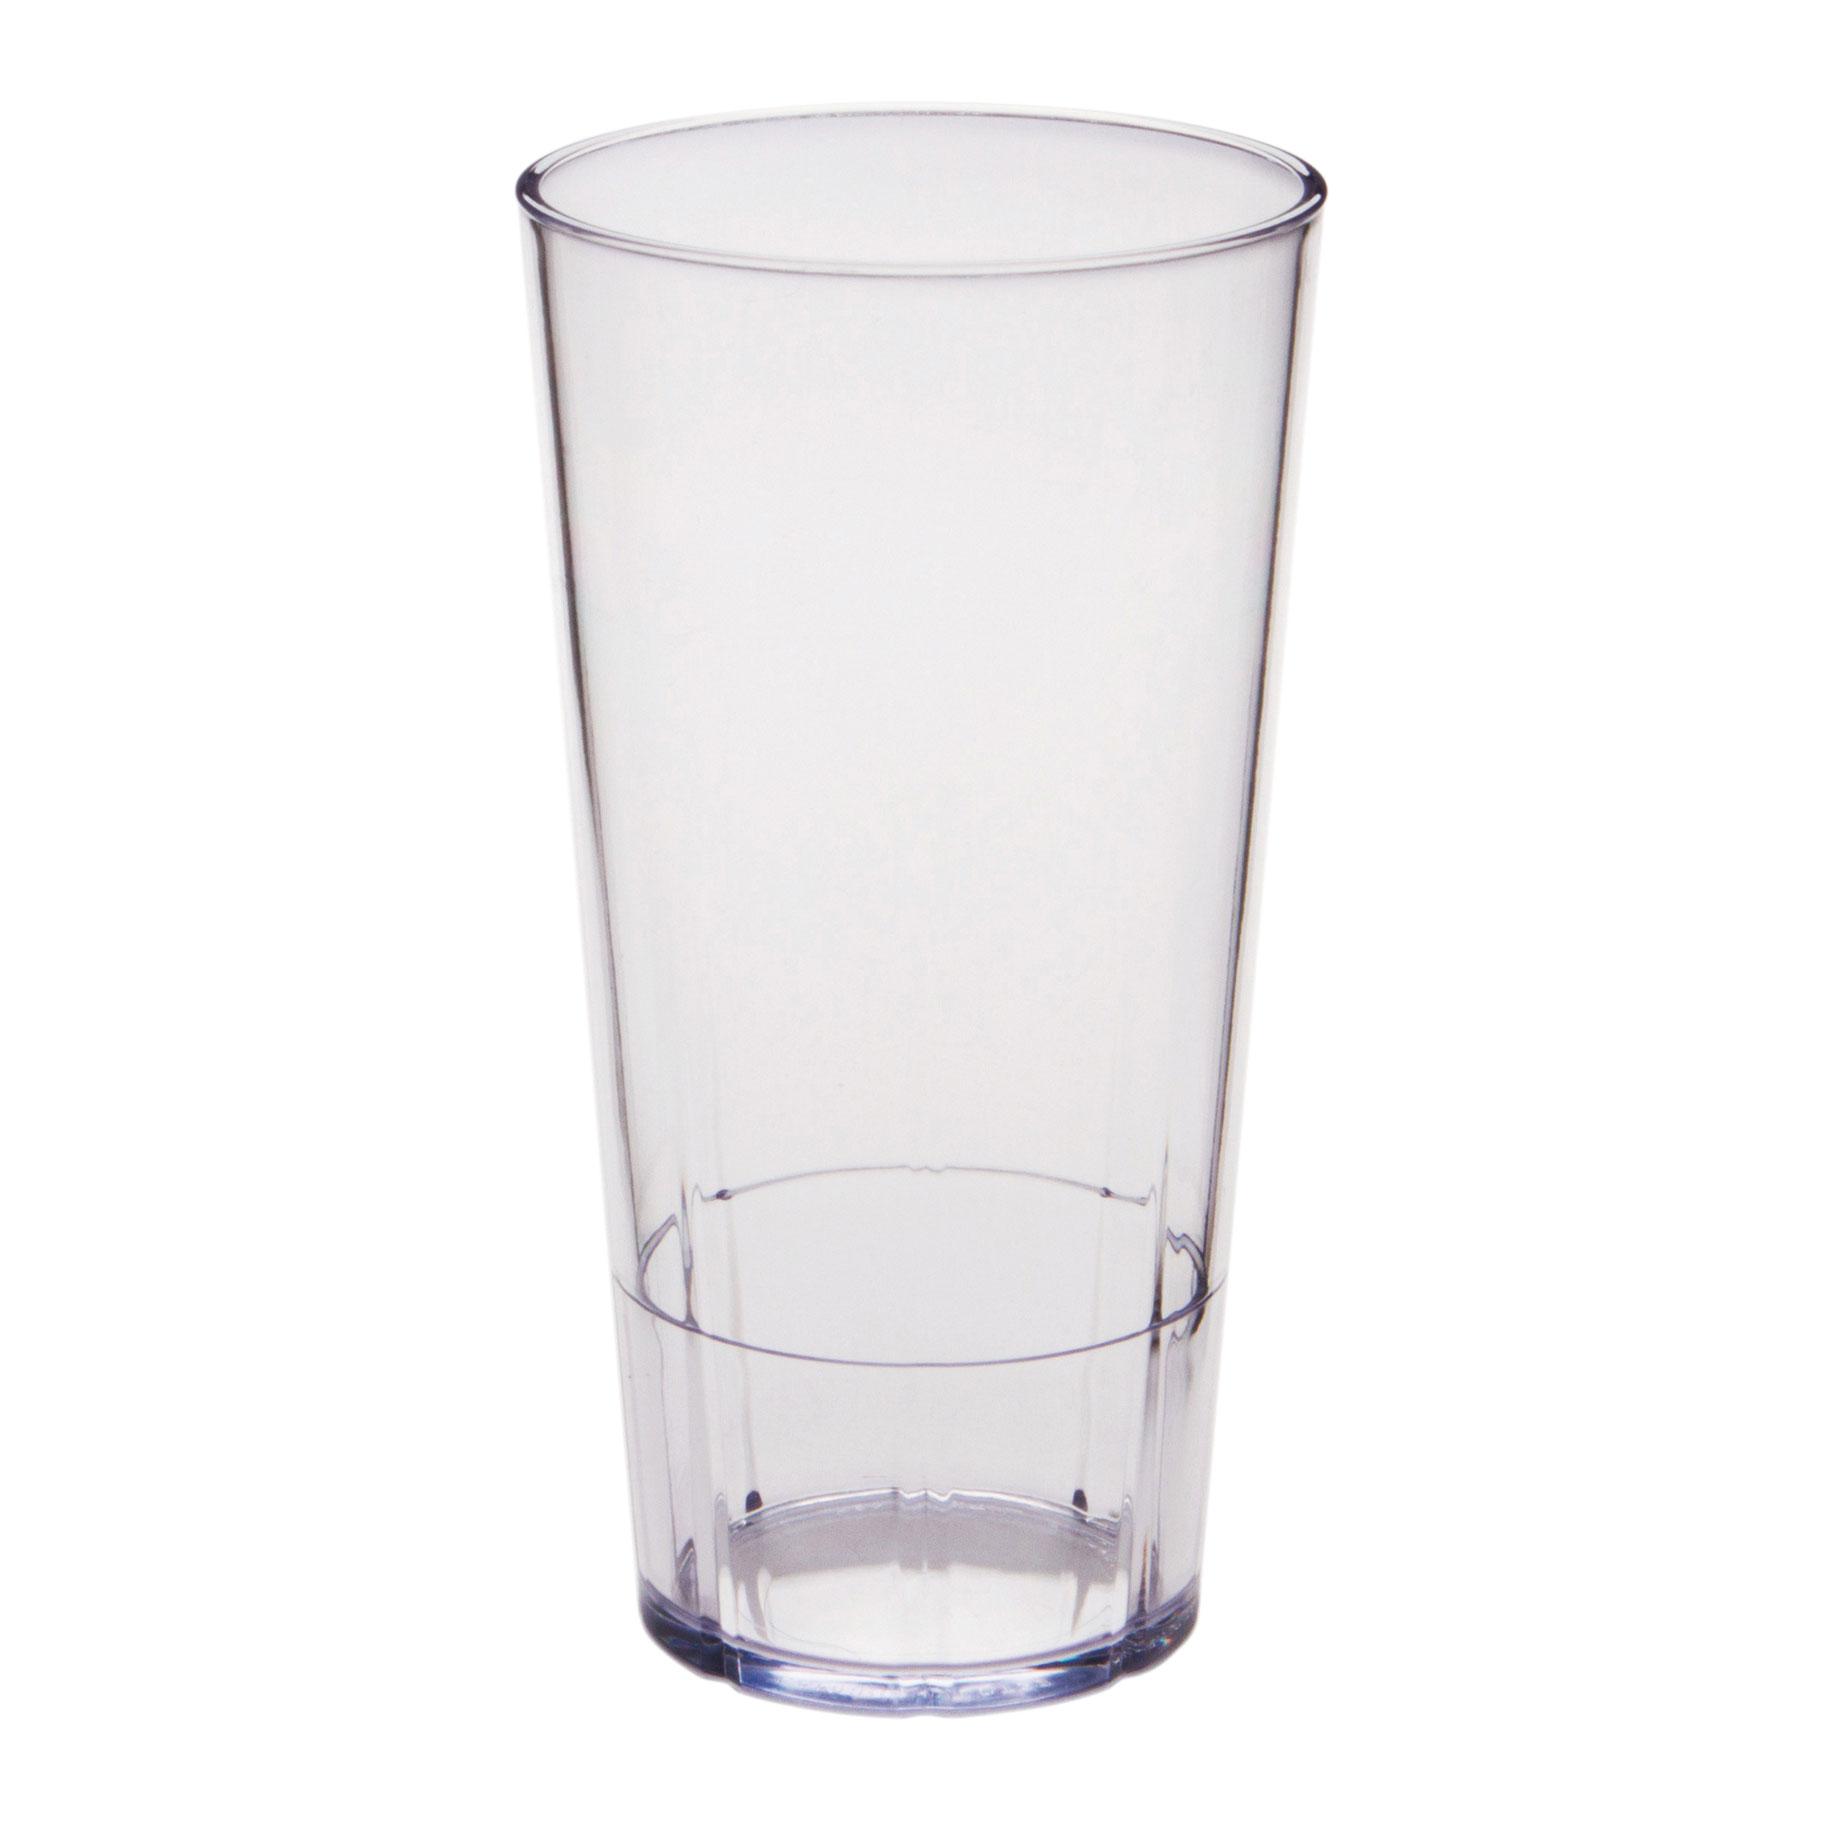 Cambro LDT22152 plastic drinkware